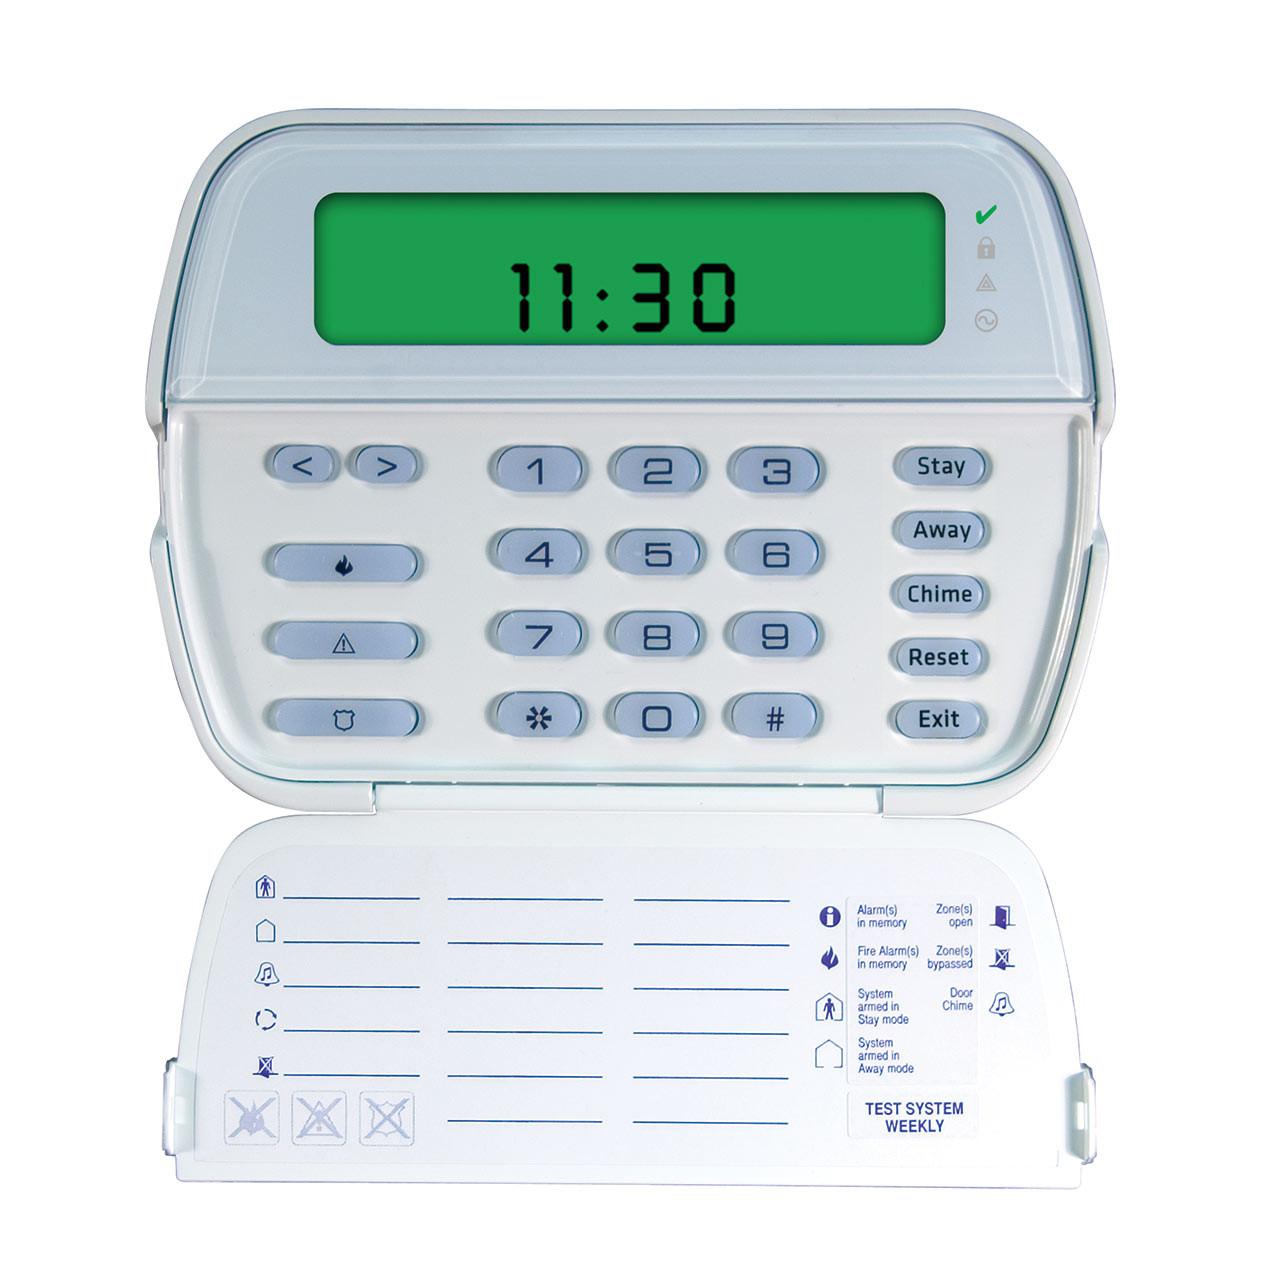 Alexor Pc9155 Installation Manual User Guide That Easy To Dsc Wiring Diagram Alarm Control Panel Open Source U2022 Rh Dramatic Varieties Com Rv Toilets Diagrams